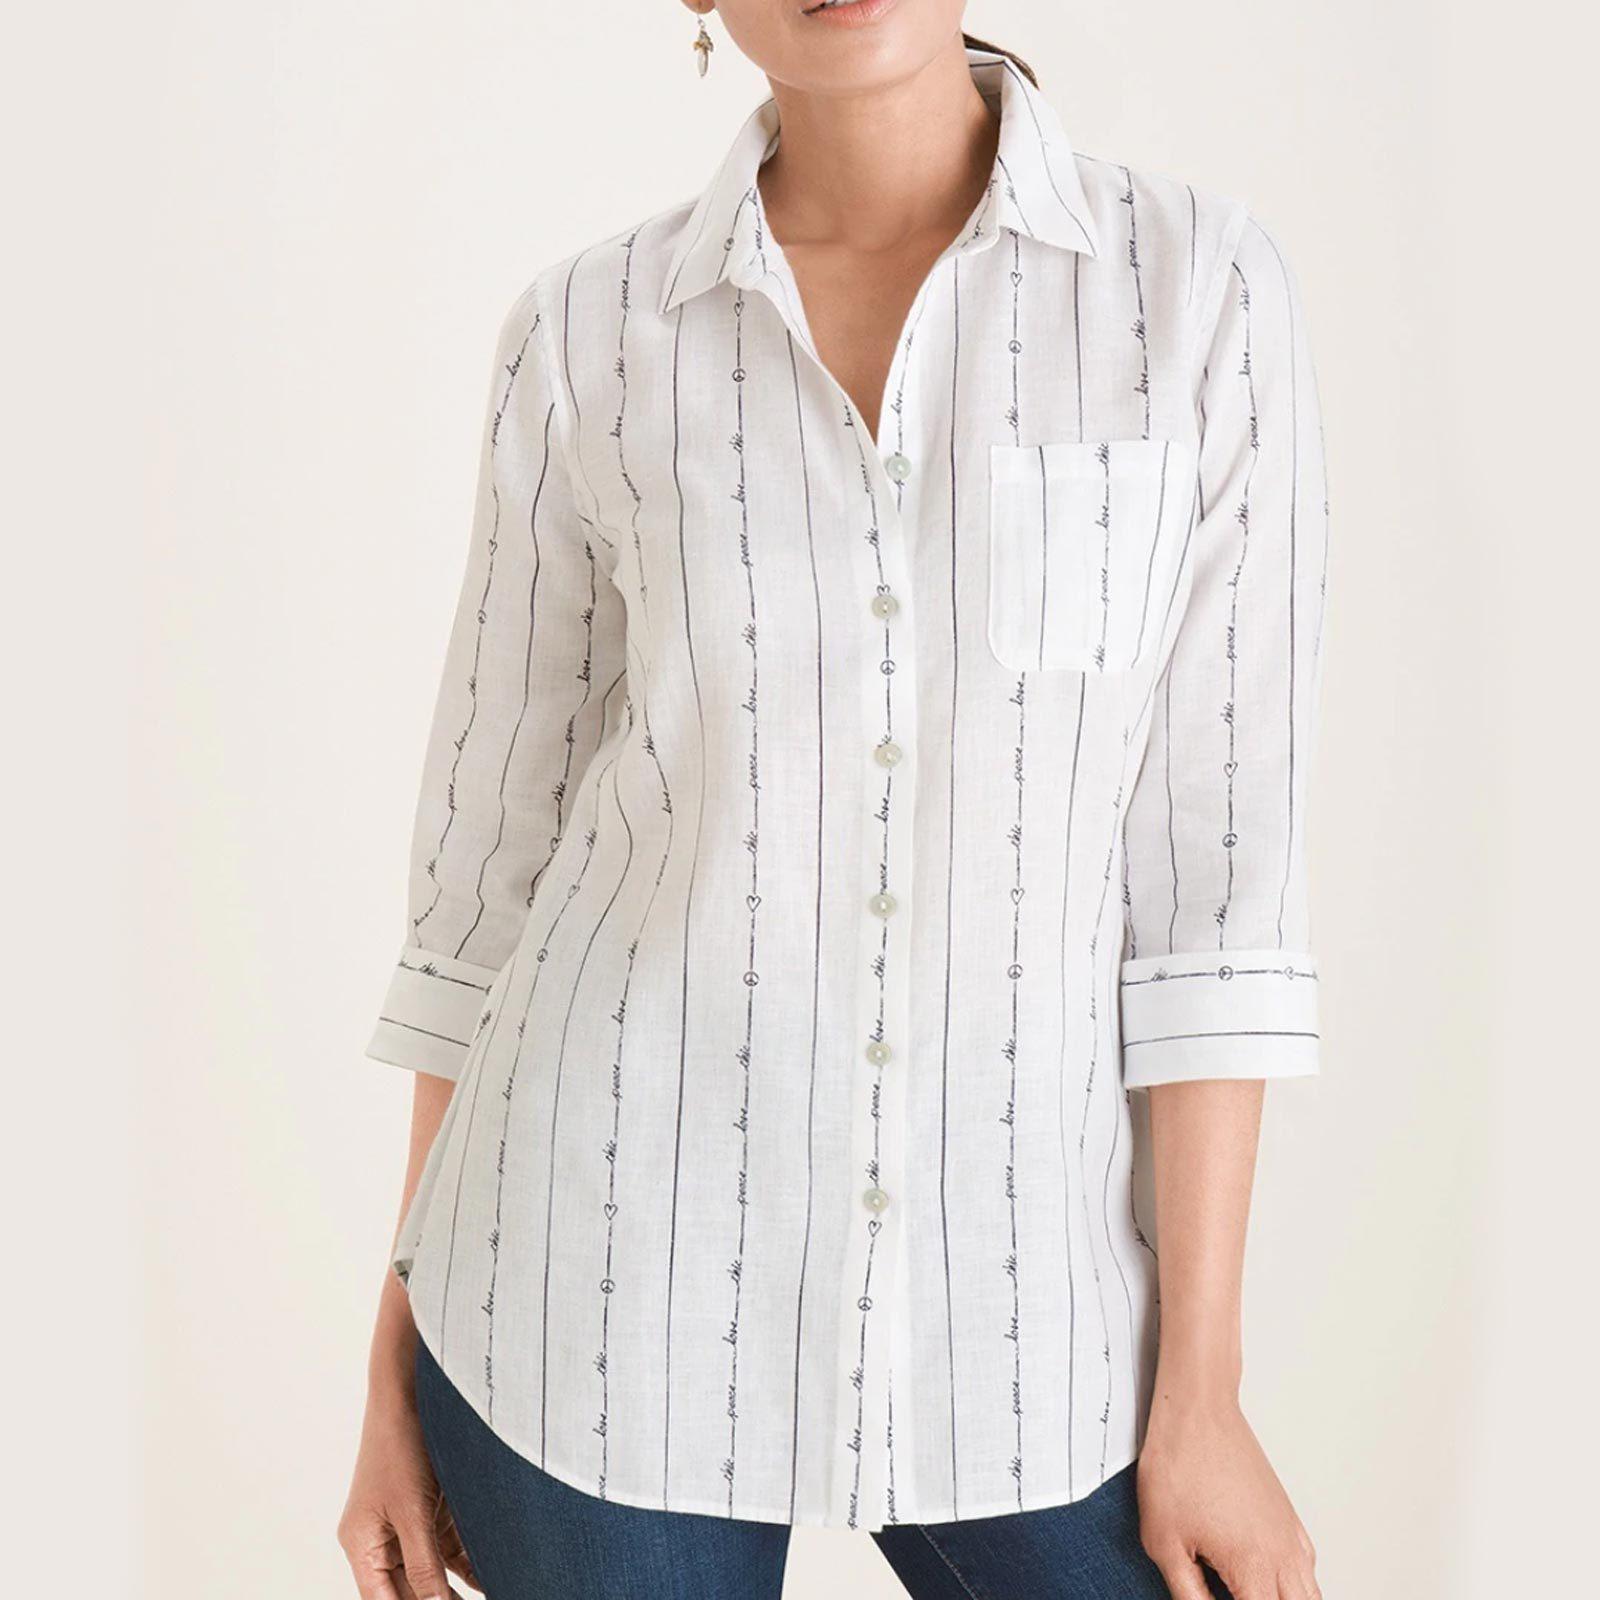 Chico's No-Iron Linen Peace Love Chic Shirt